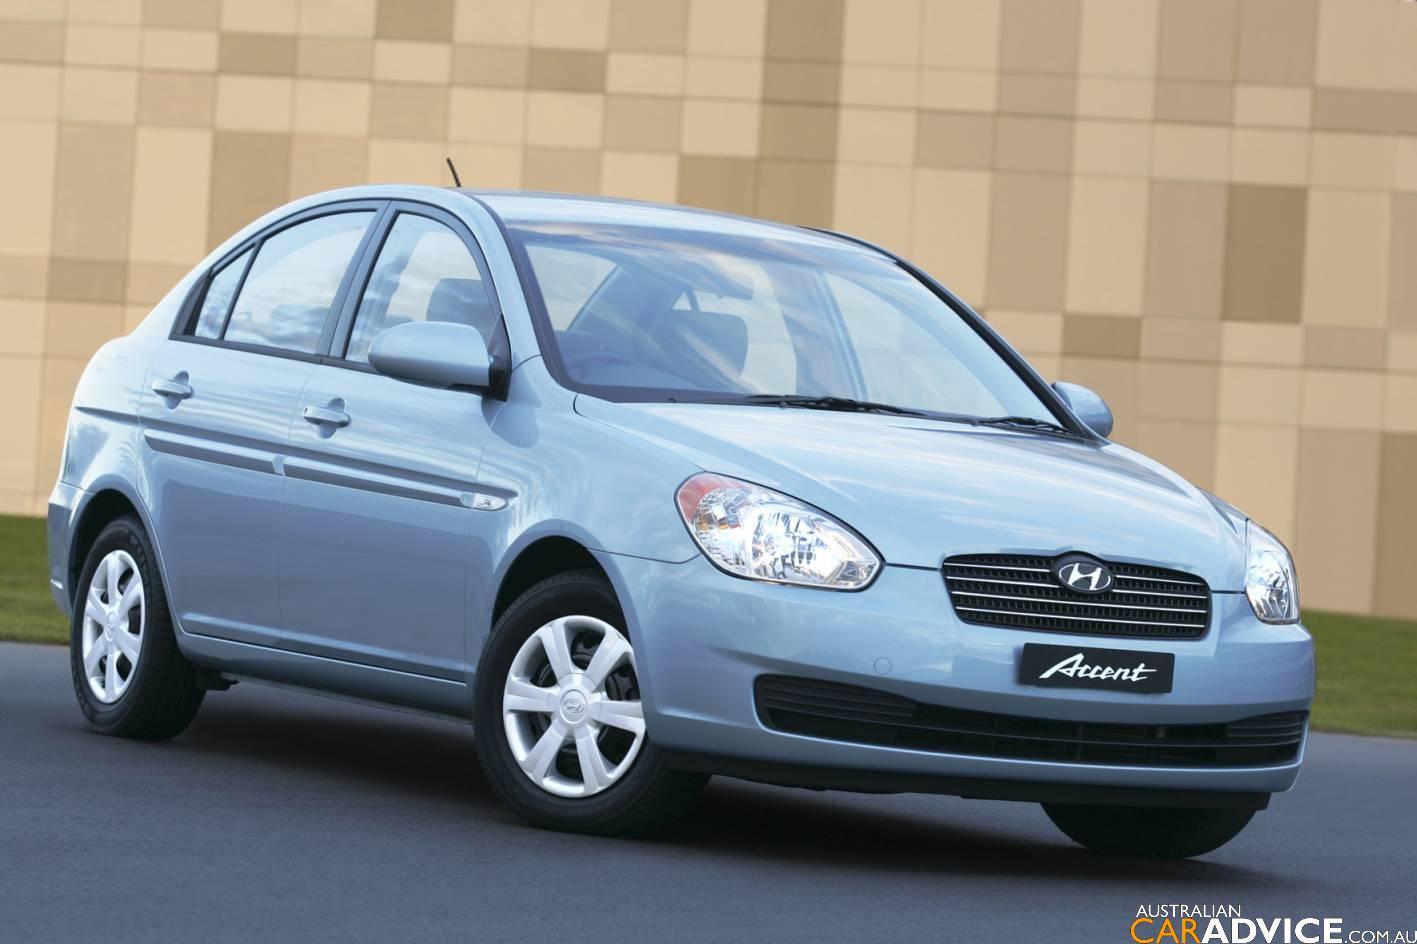 2007 Hyundai Accent Road Test | CarAdvice